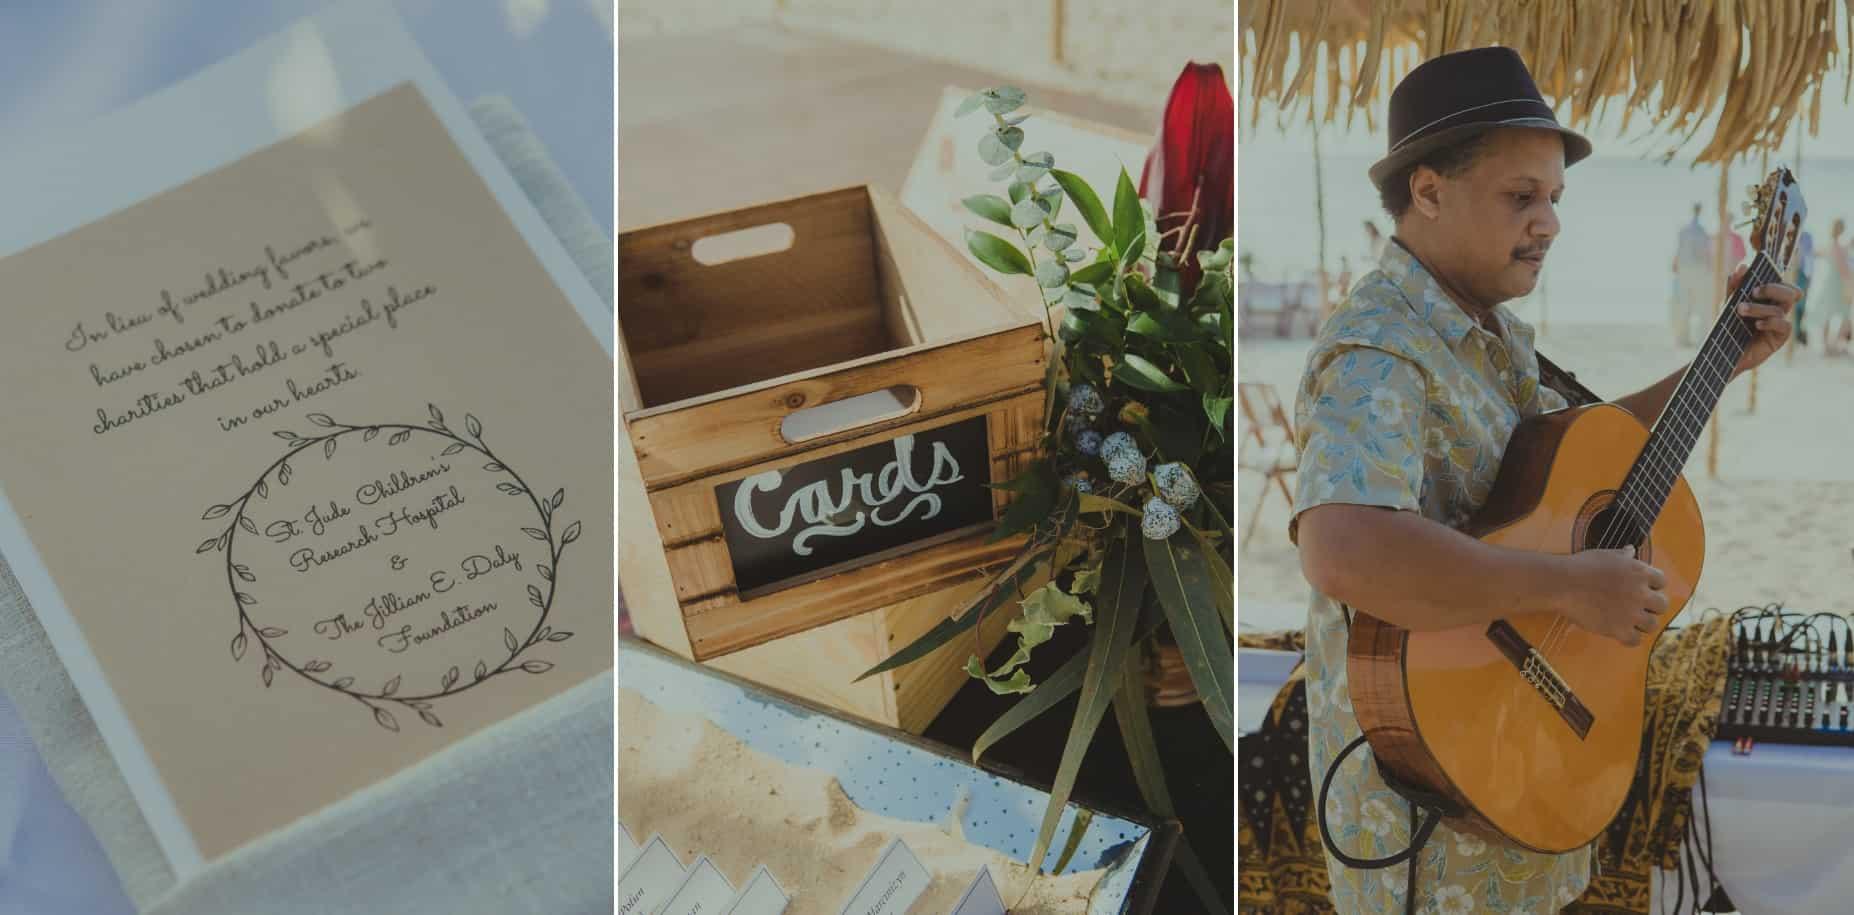 wedding-ceremony-details-menu-cards-celebrations-ltd-cayman-islands-destination-wedding